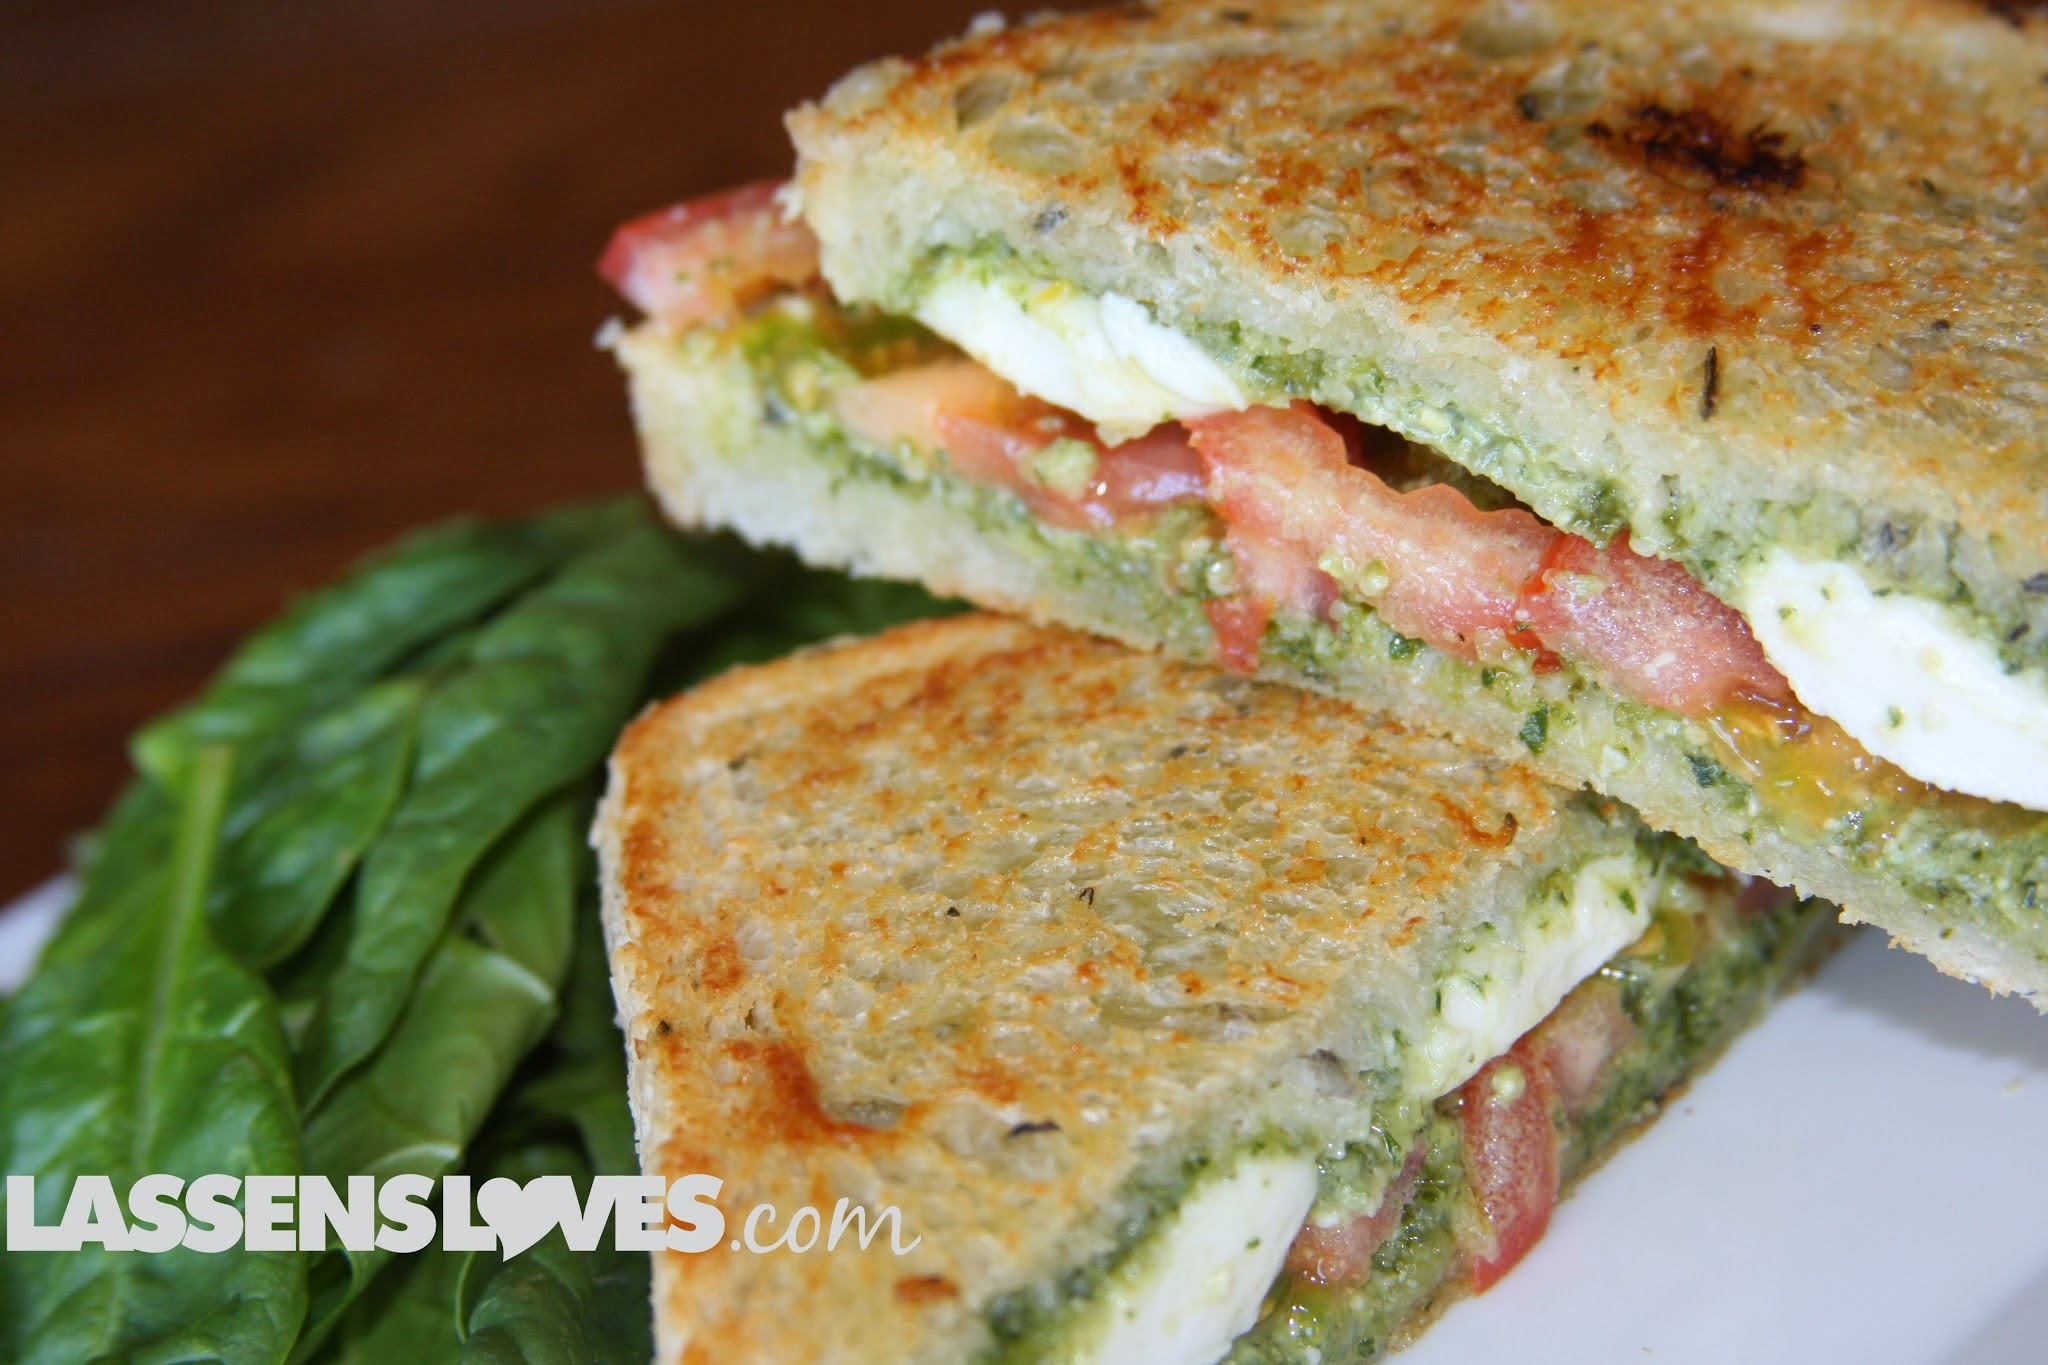 pesto+caprese+sandwich, caprese+panini, pesto+caprese, pesto+panini